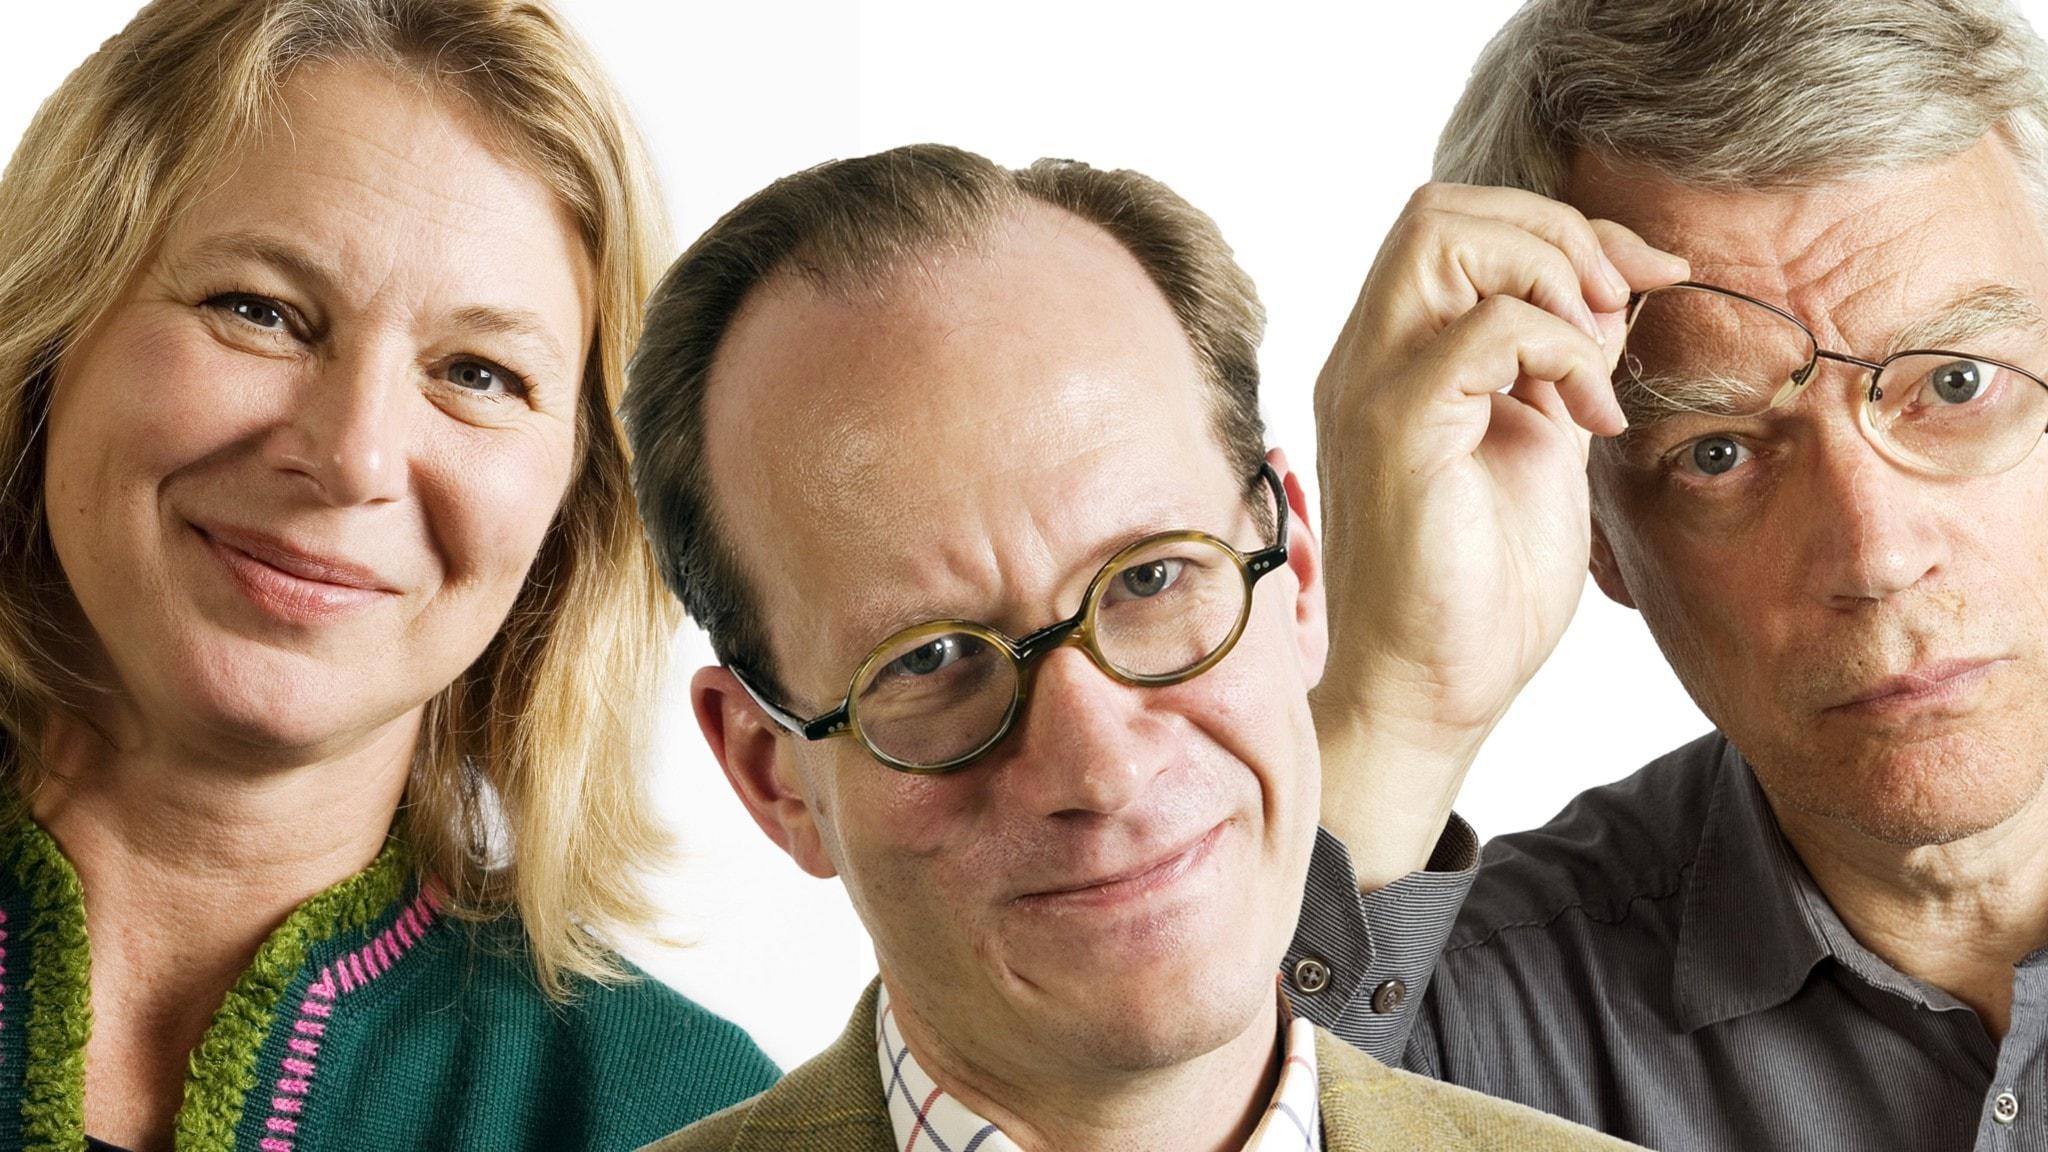 Helena von Zweigbergk, Johan Hakelius och Jonas Hallberg. Foto Micke Grönberg och Mattias Ahlm Sveriges Radio